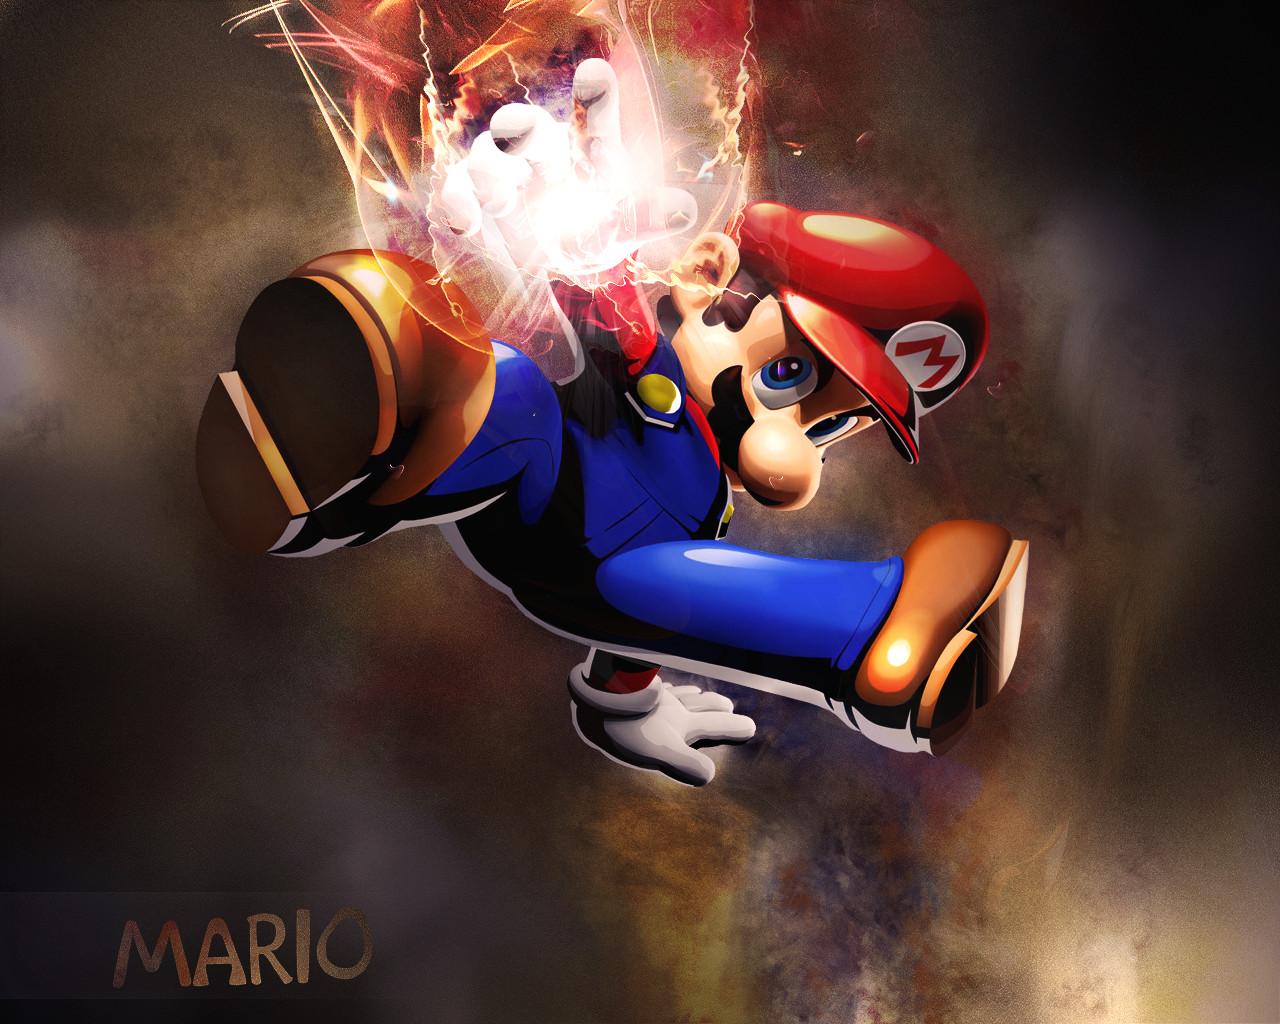 Mario Desktop Backgrounds: Epic Mario Wallpaper